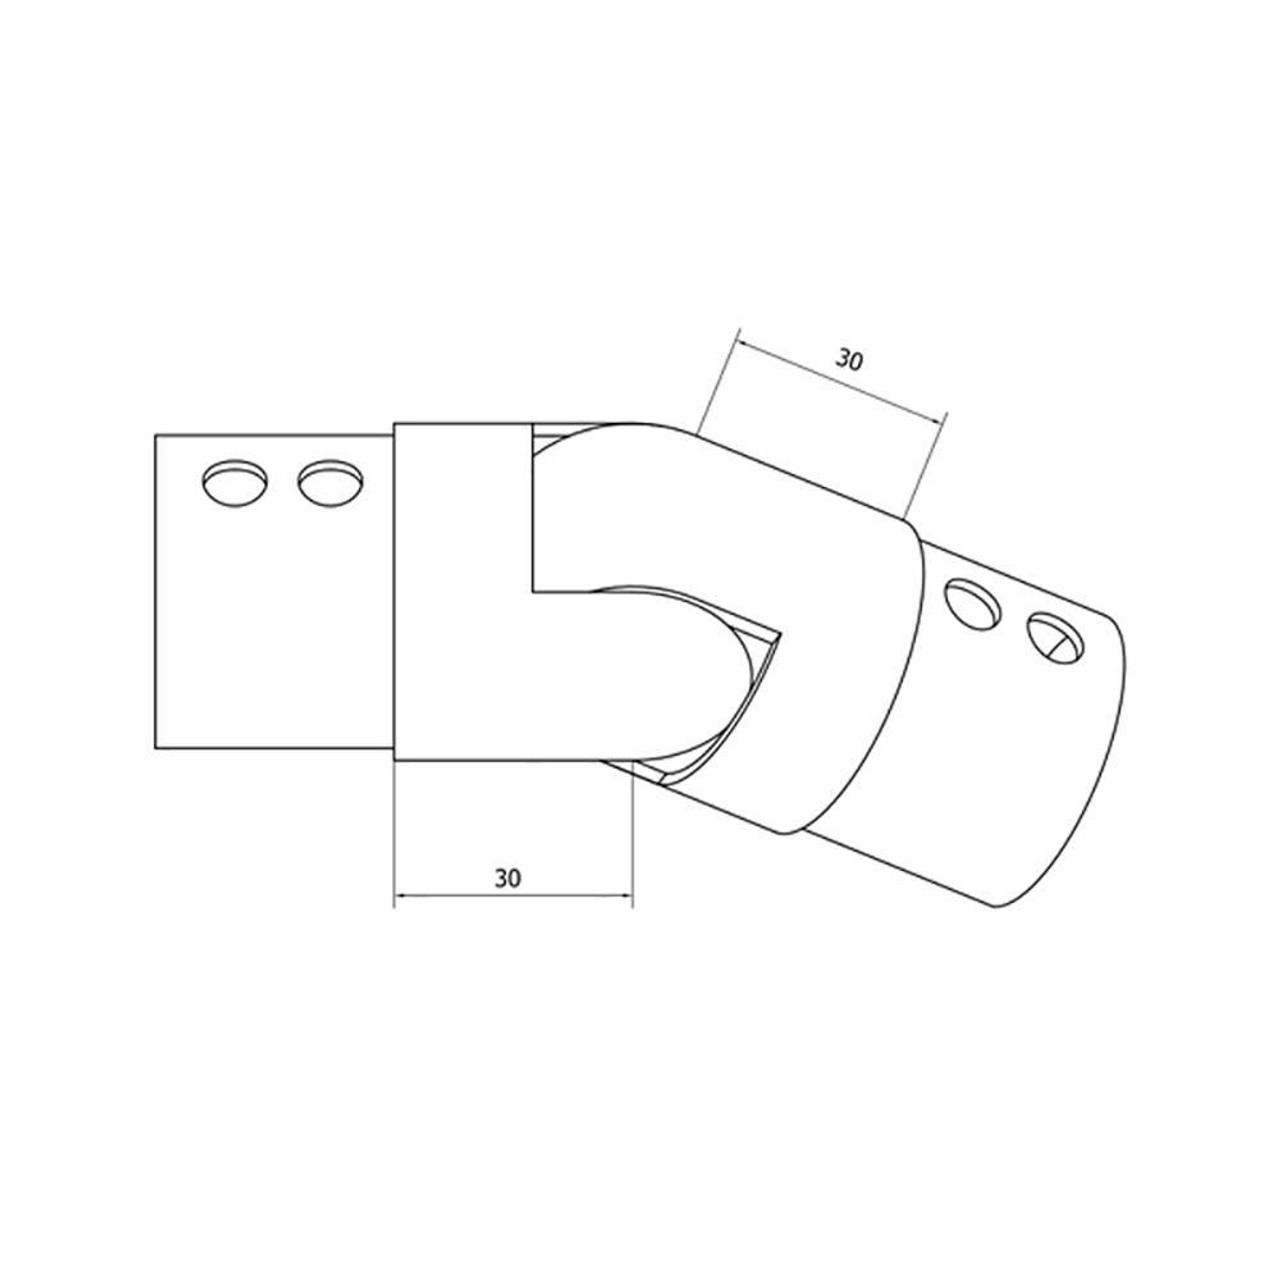 Round Glass Cap Rail Adjustable Fitting Downward (CADD)